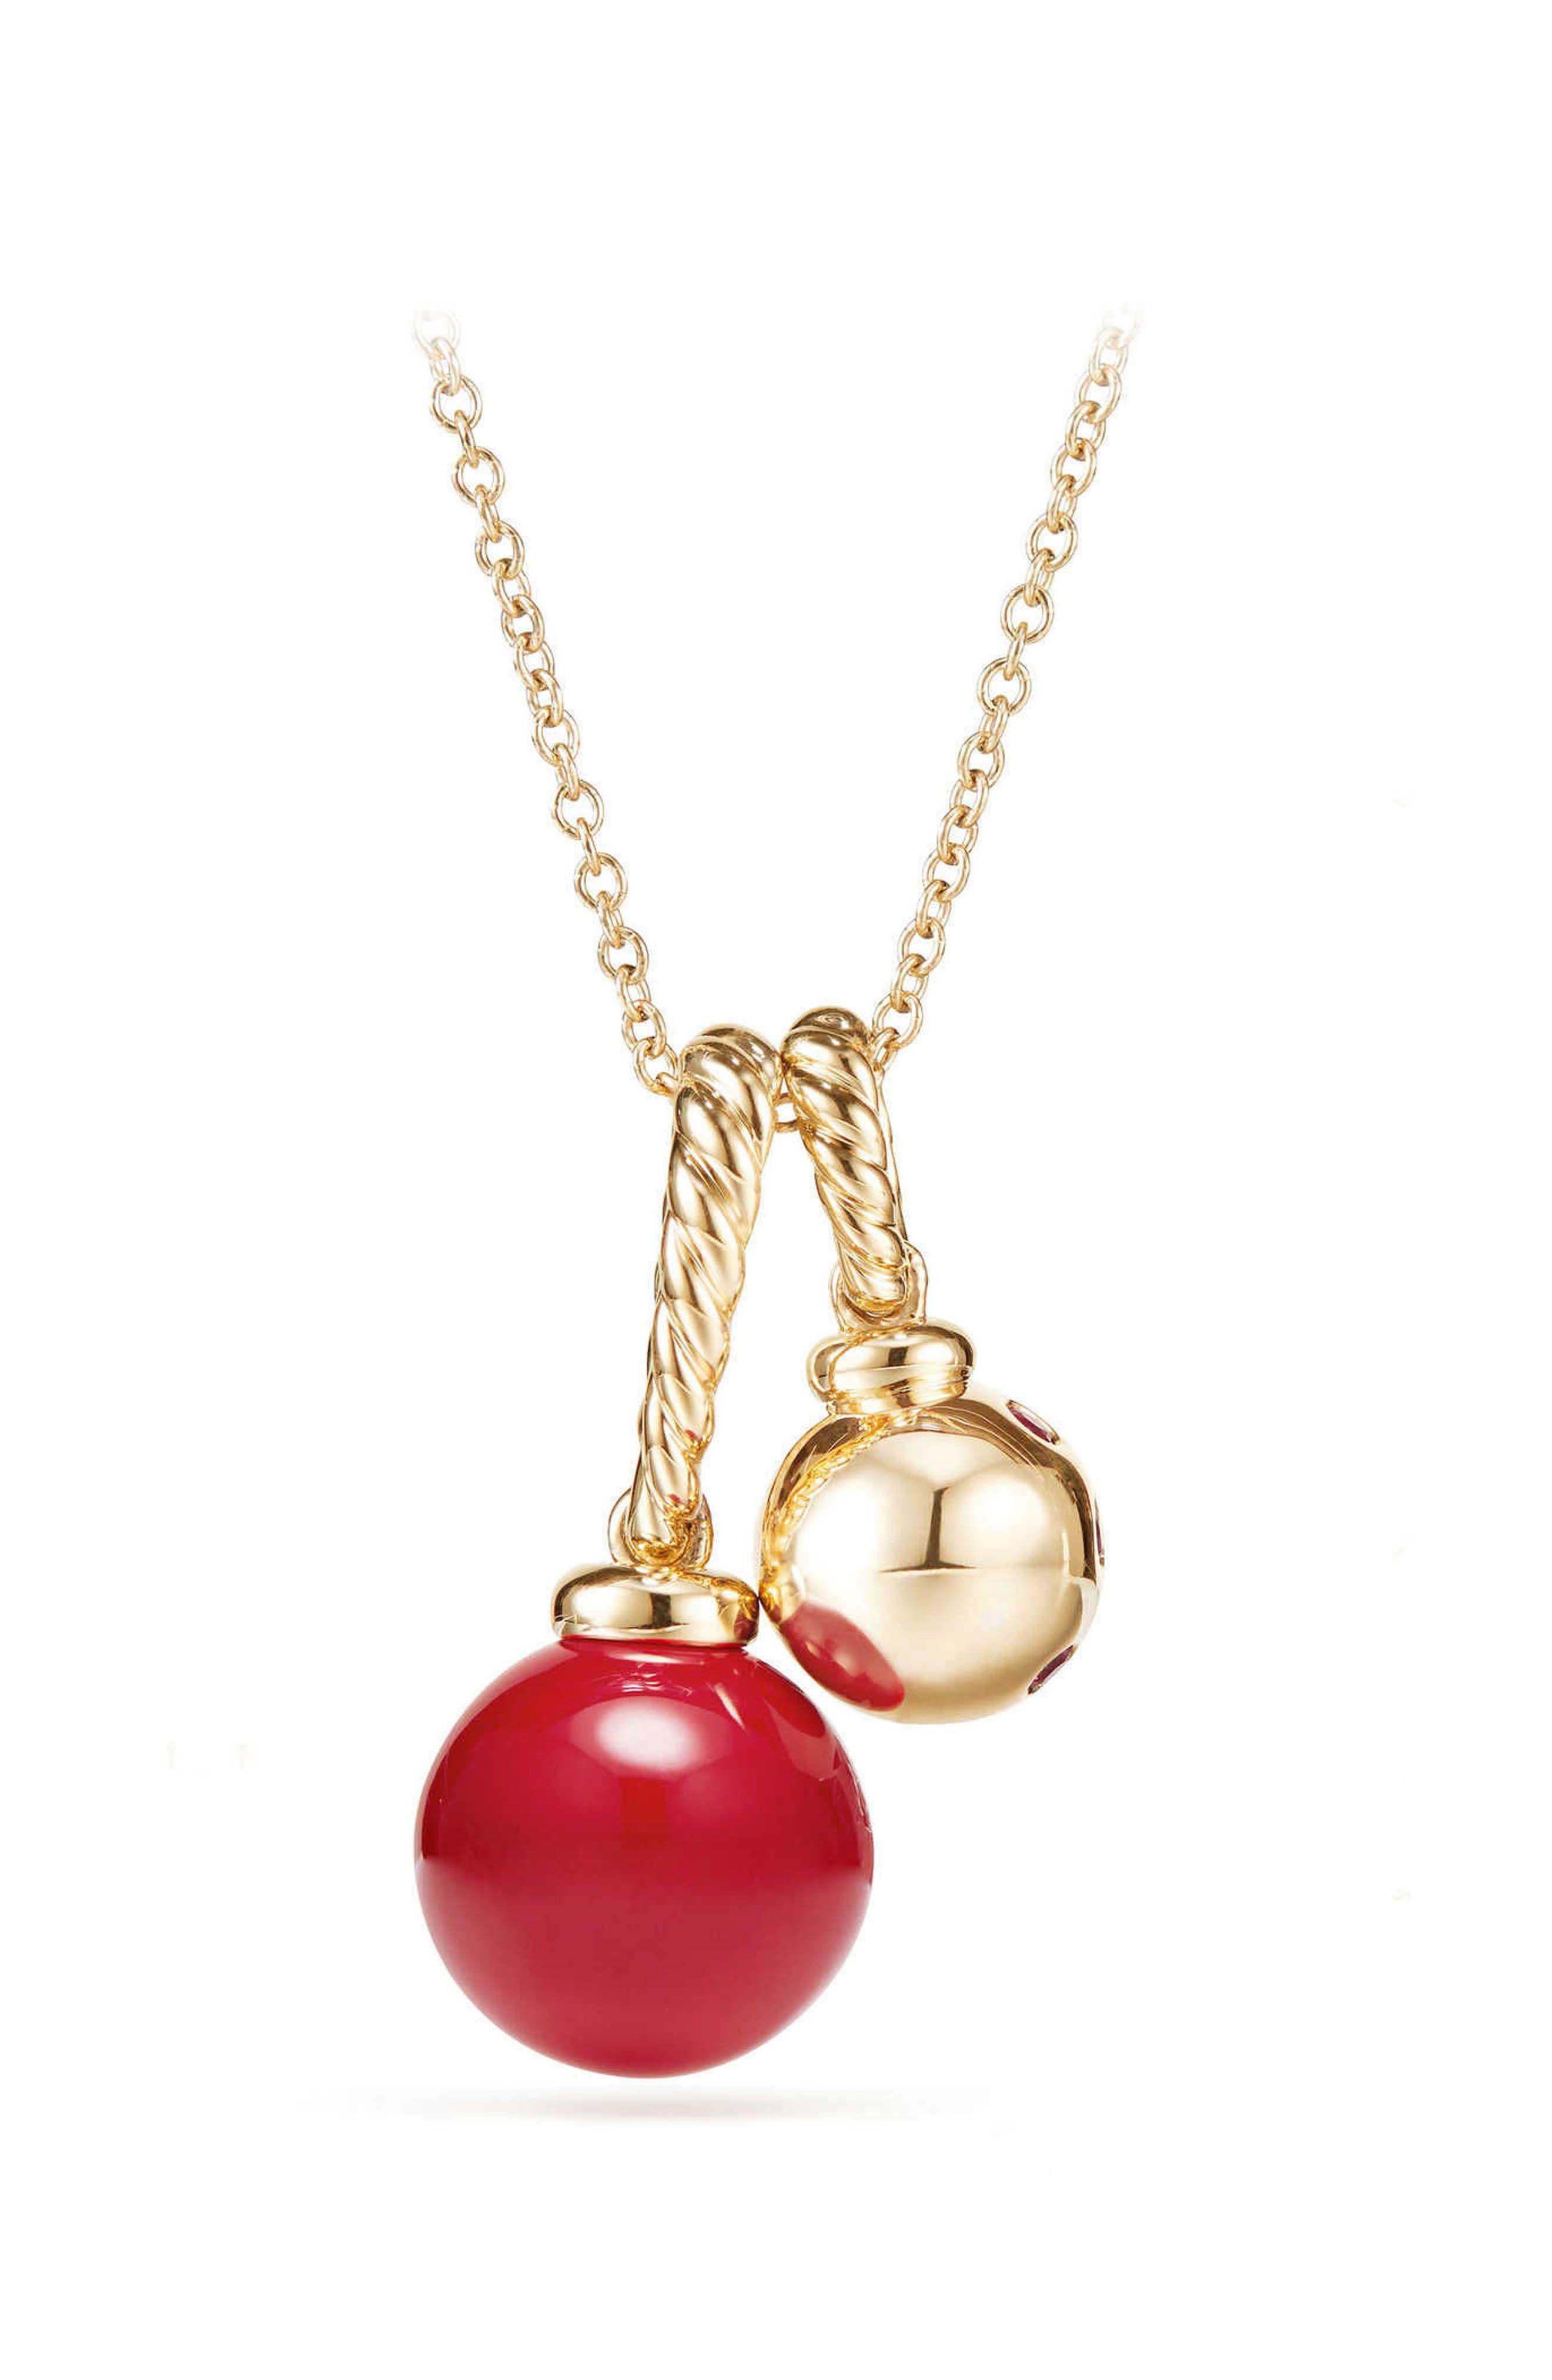 Main Image - David Yurman Solari Pendant Necklace in 18K Gold with Cherry Amber